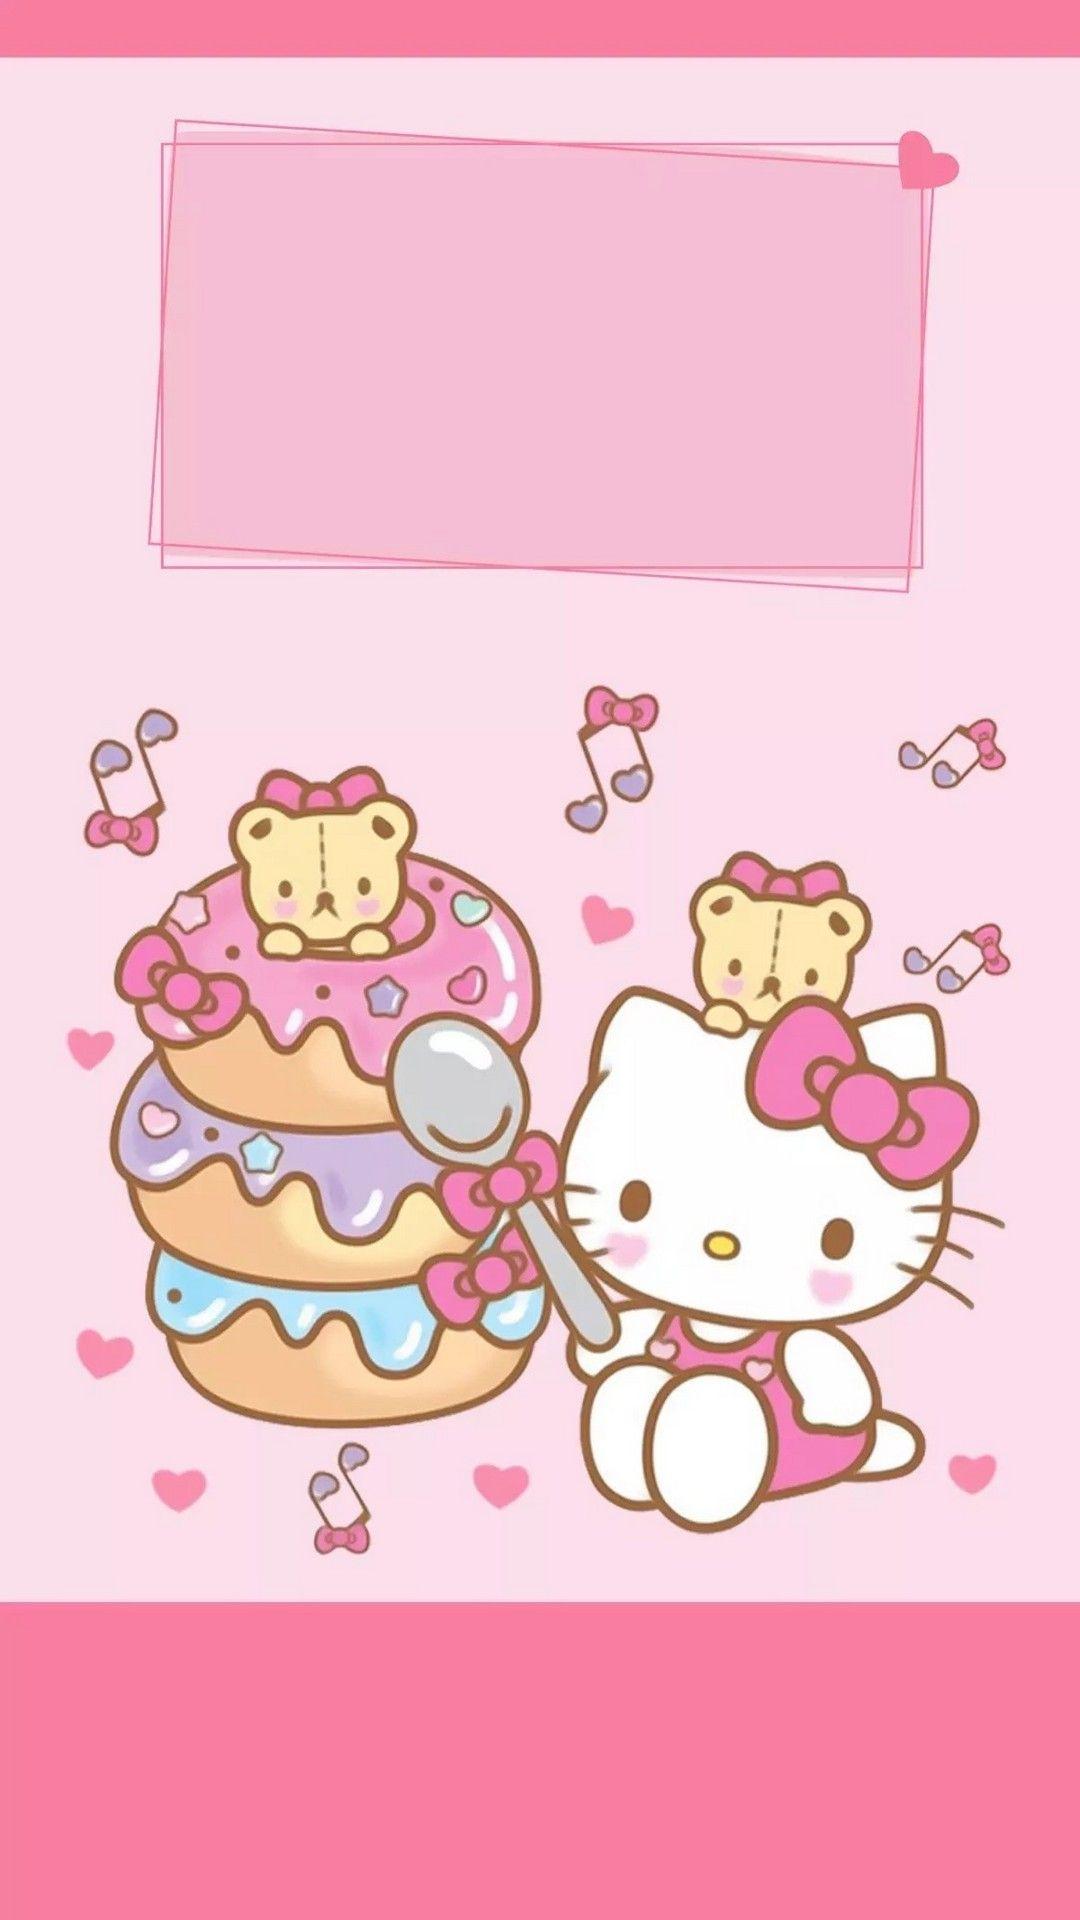 Hello Kitty Iphone 7 Wallpaper Hello Kitty Backgrounds Hello